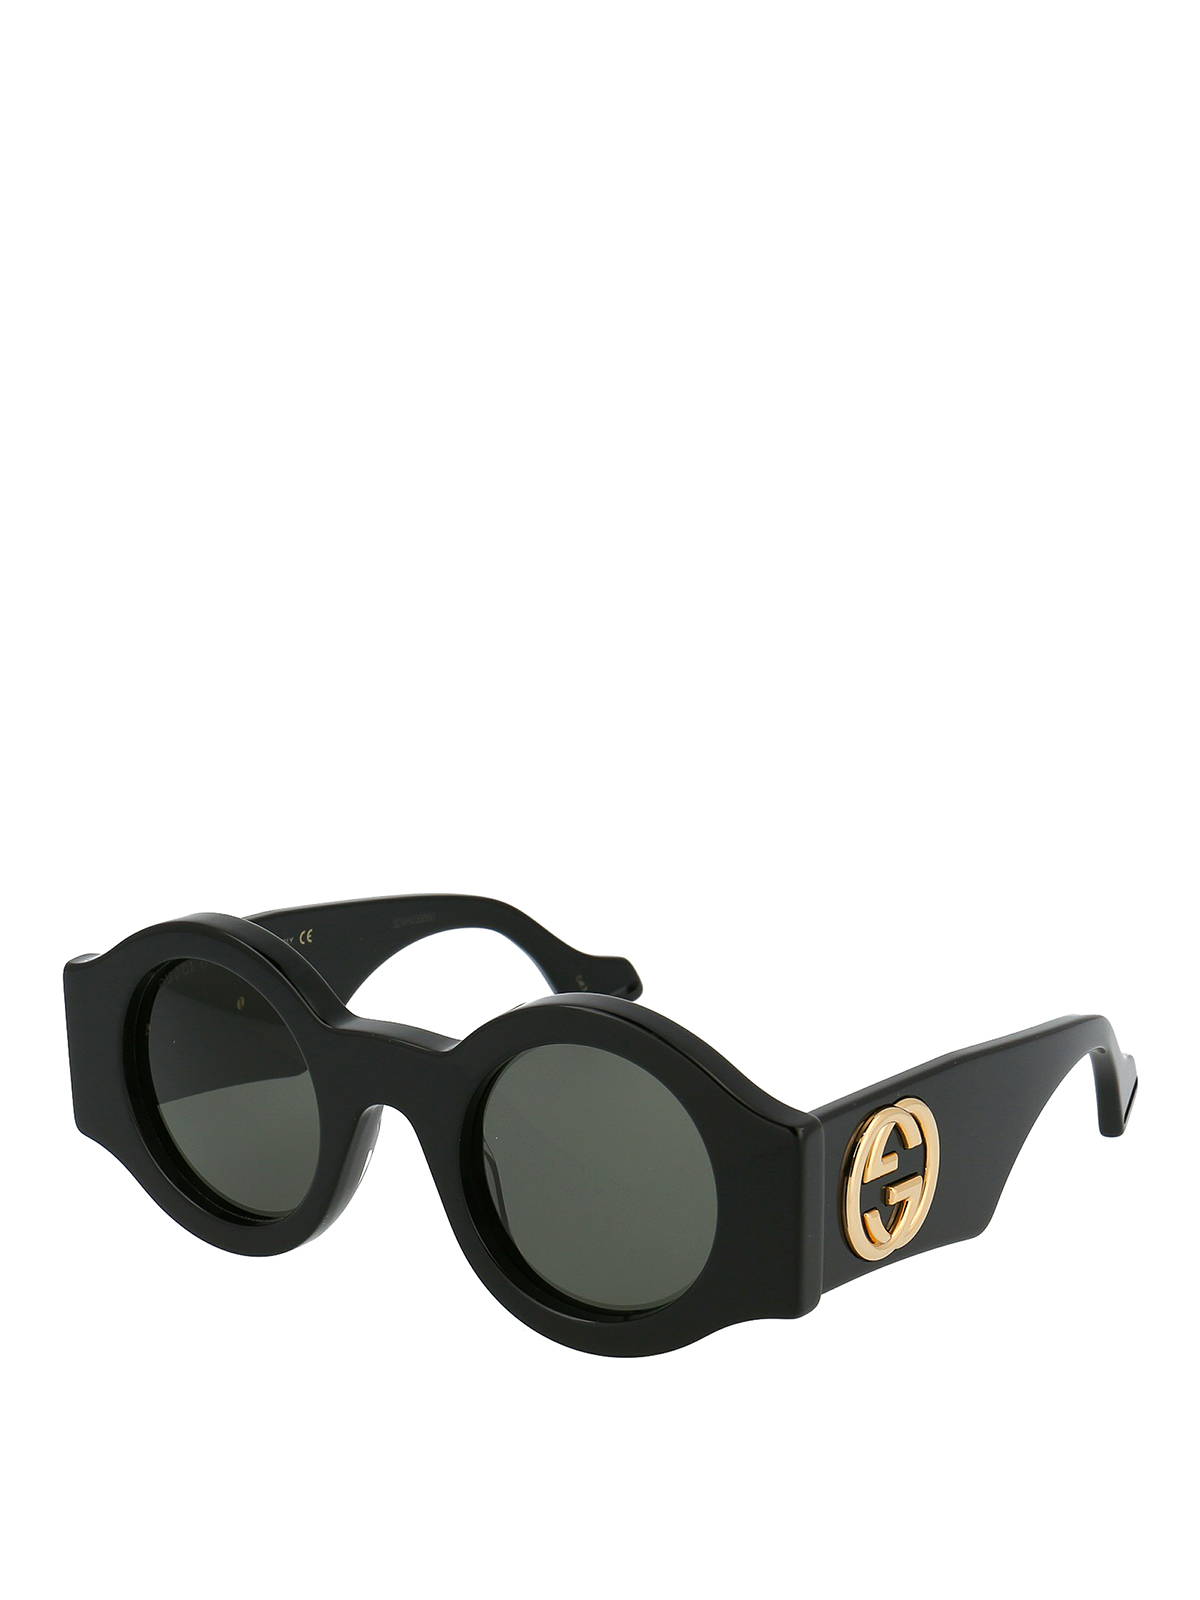 Gucci Golden Gg Logo Round Acetate Sunglasses In Black